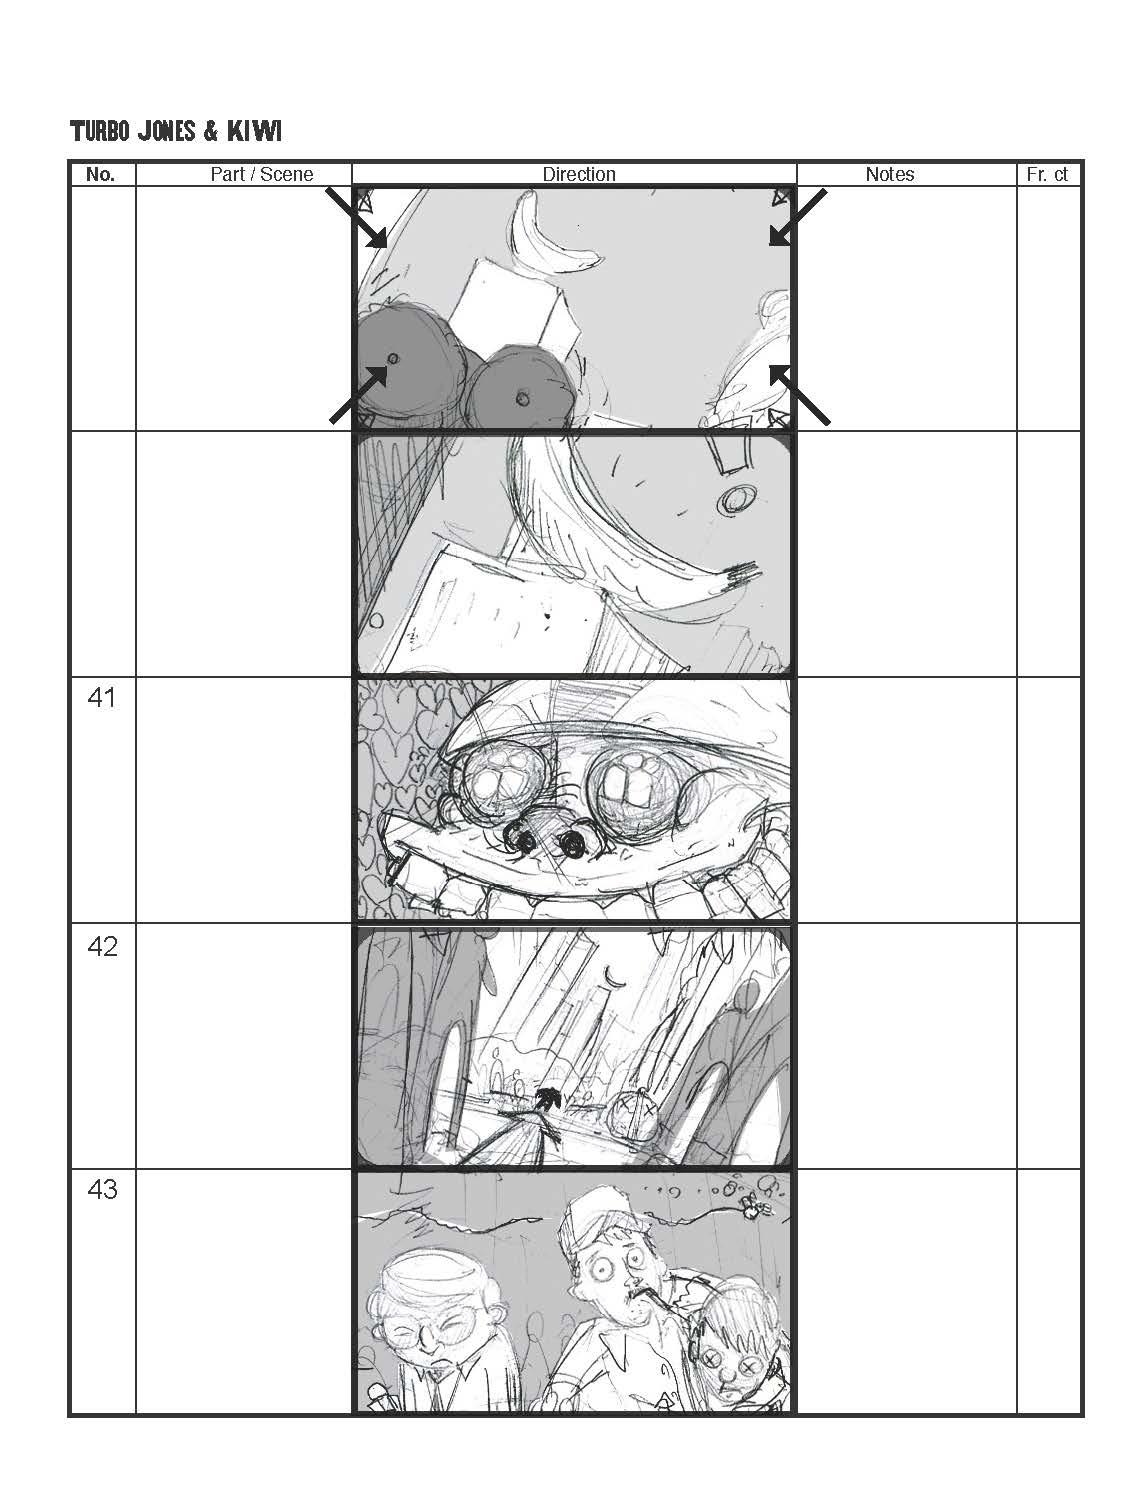 TJK_Storyboards_v01_HIGH_Page_22.jpg